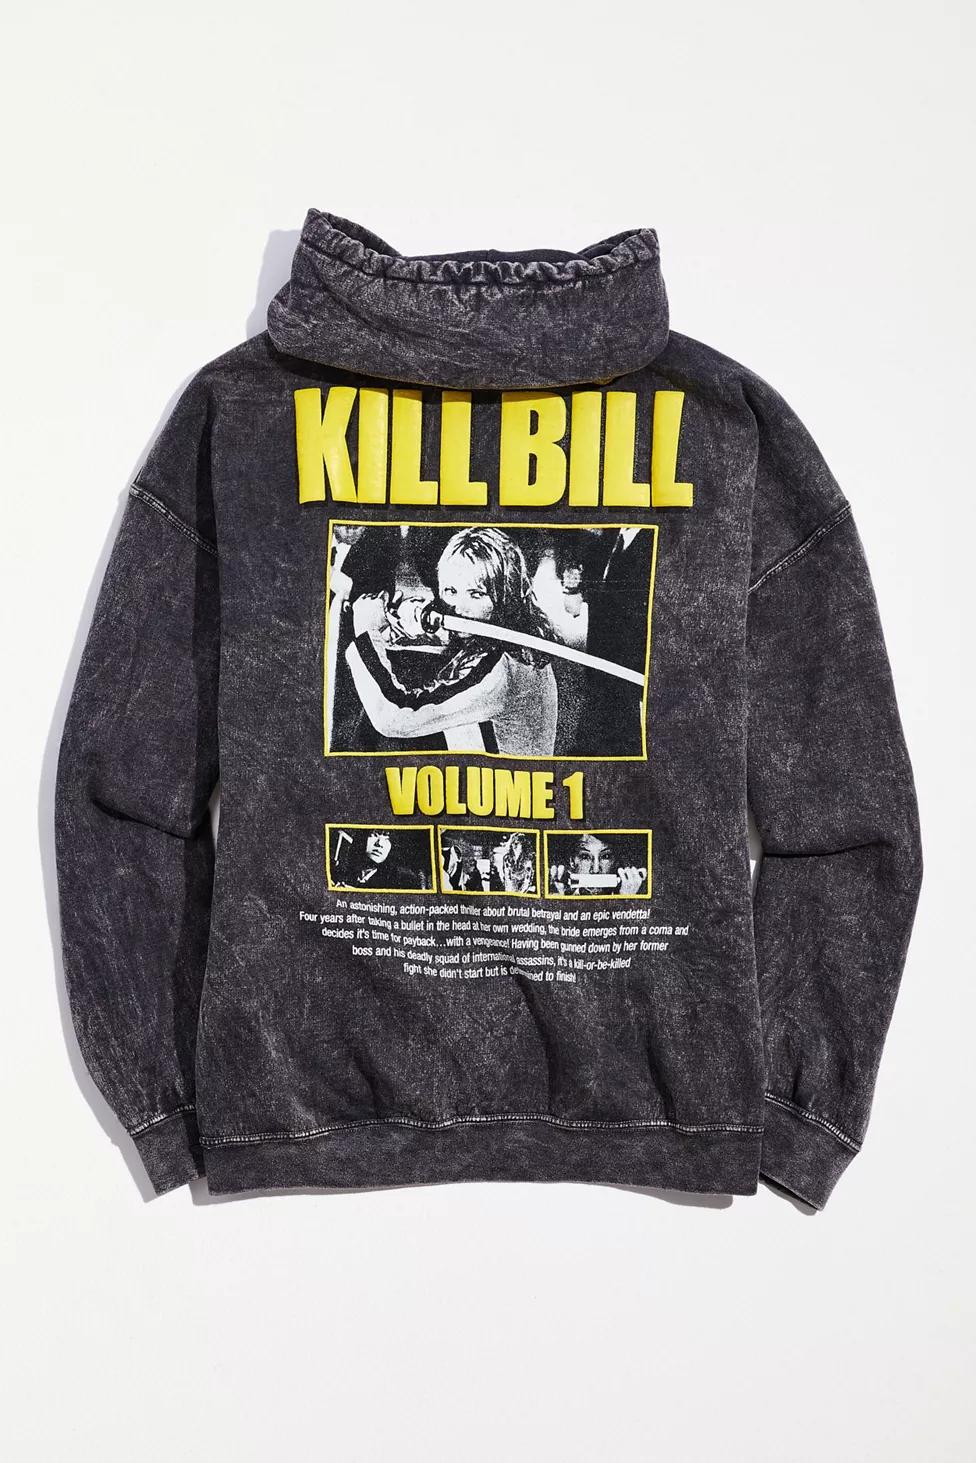 Download Kill Bill Overdyed Hoodie Sweatshirt Urban Outfitters Hoodies Hoodies Men Sweatshirts